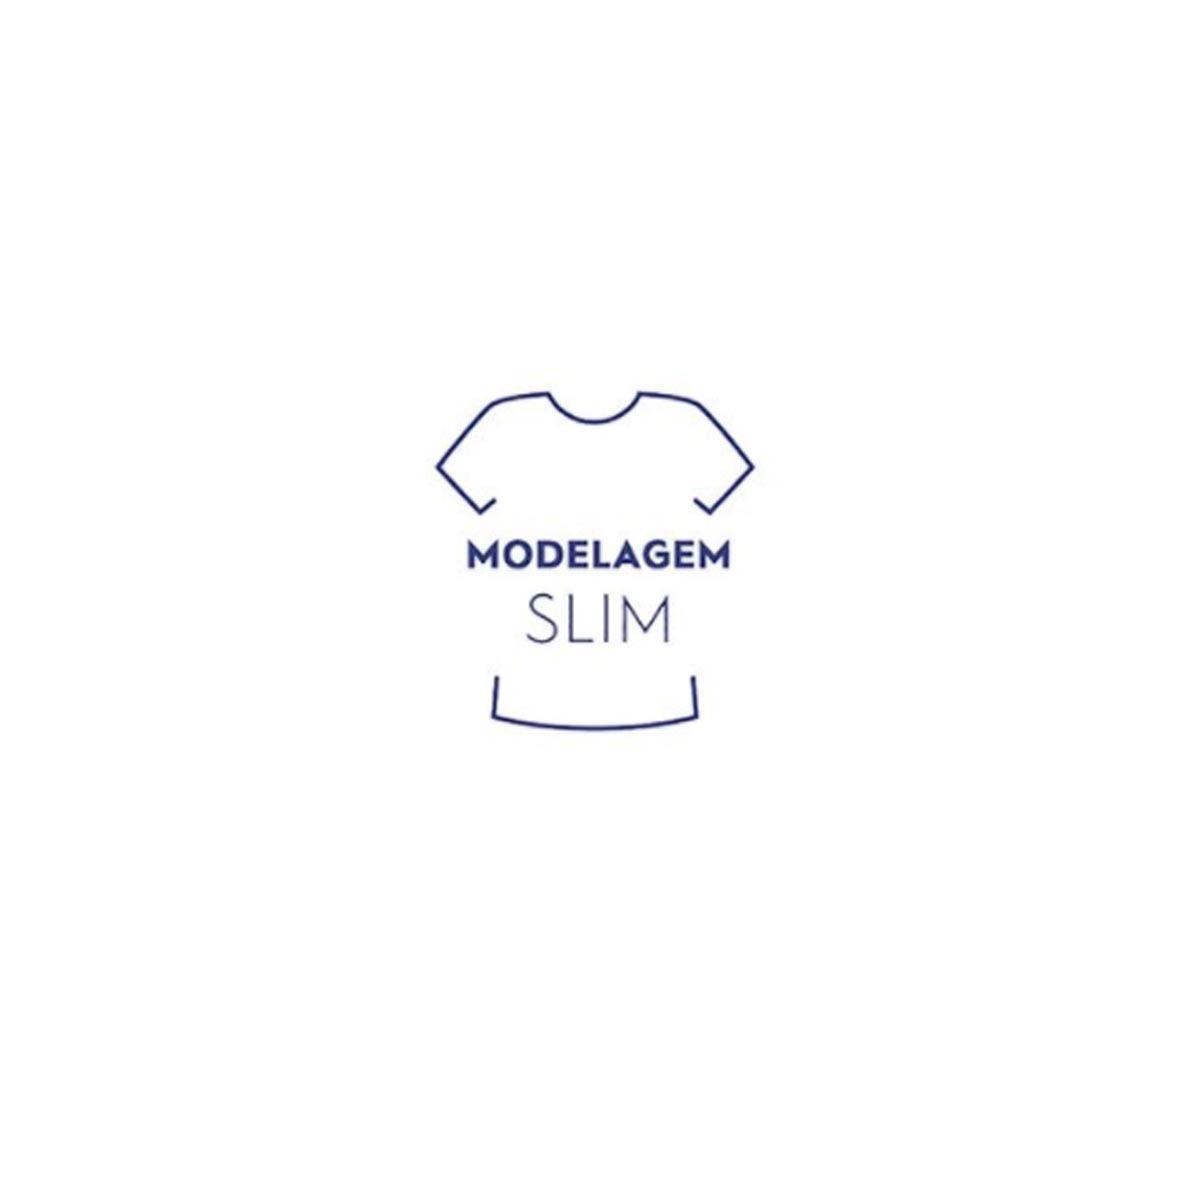 Camisa Polo Hering Masculina Manga Curta Piquet 0393 - R  49 68ffddcdf8647